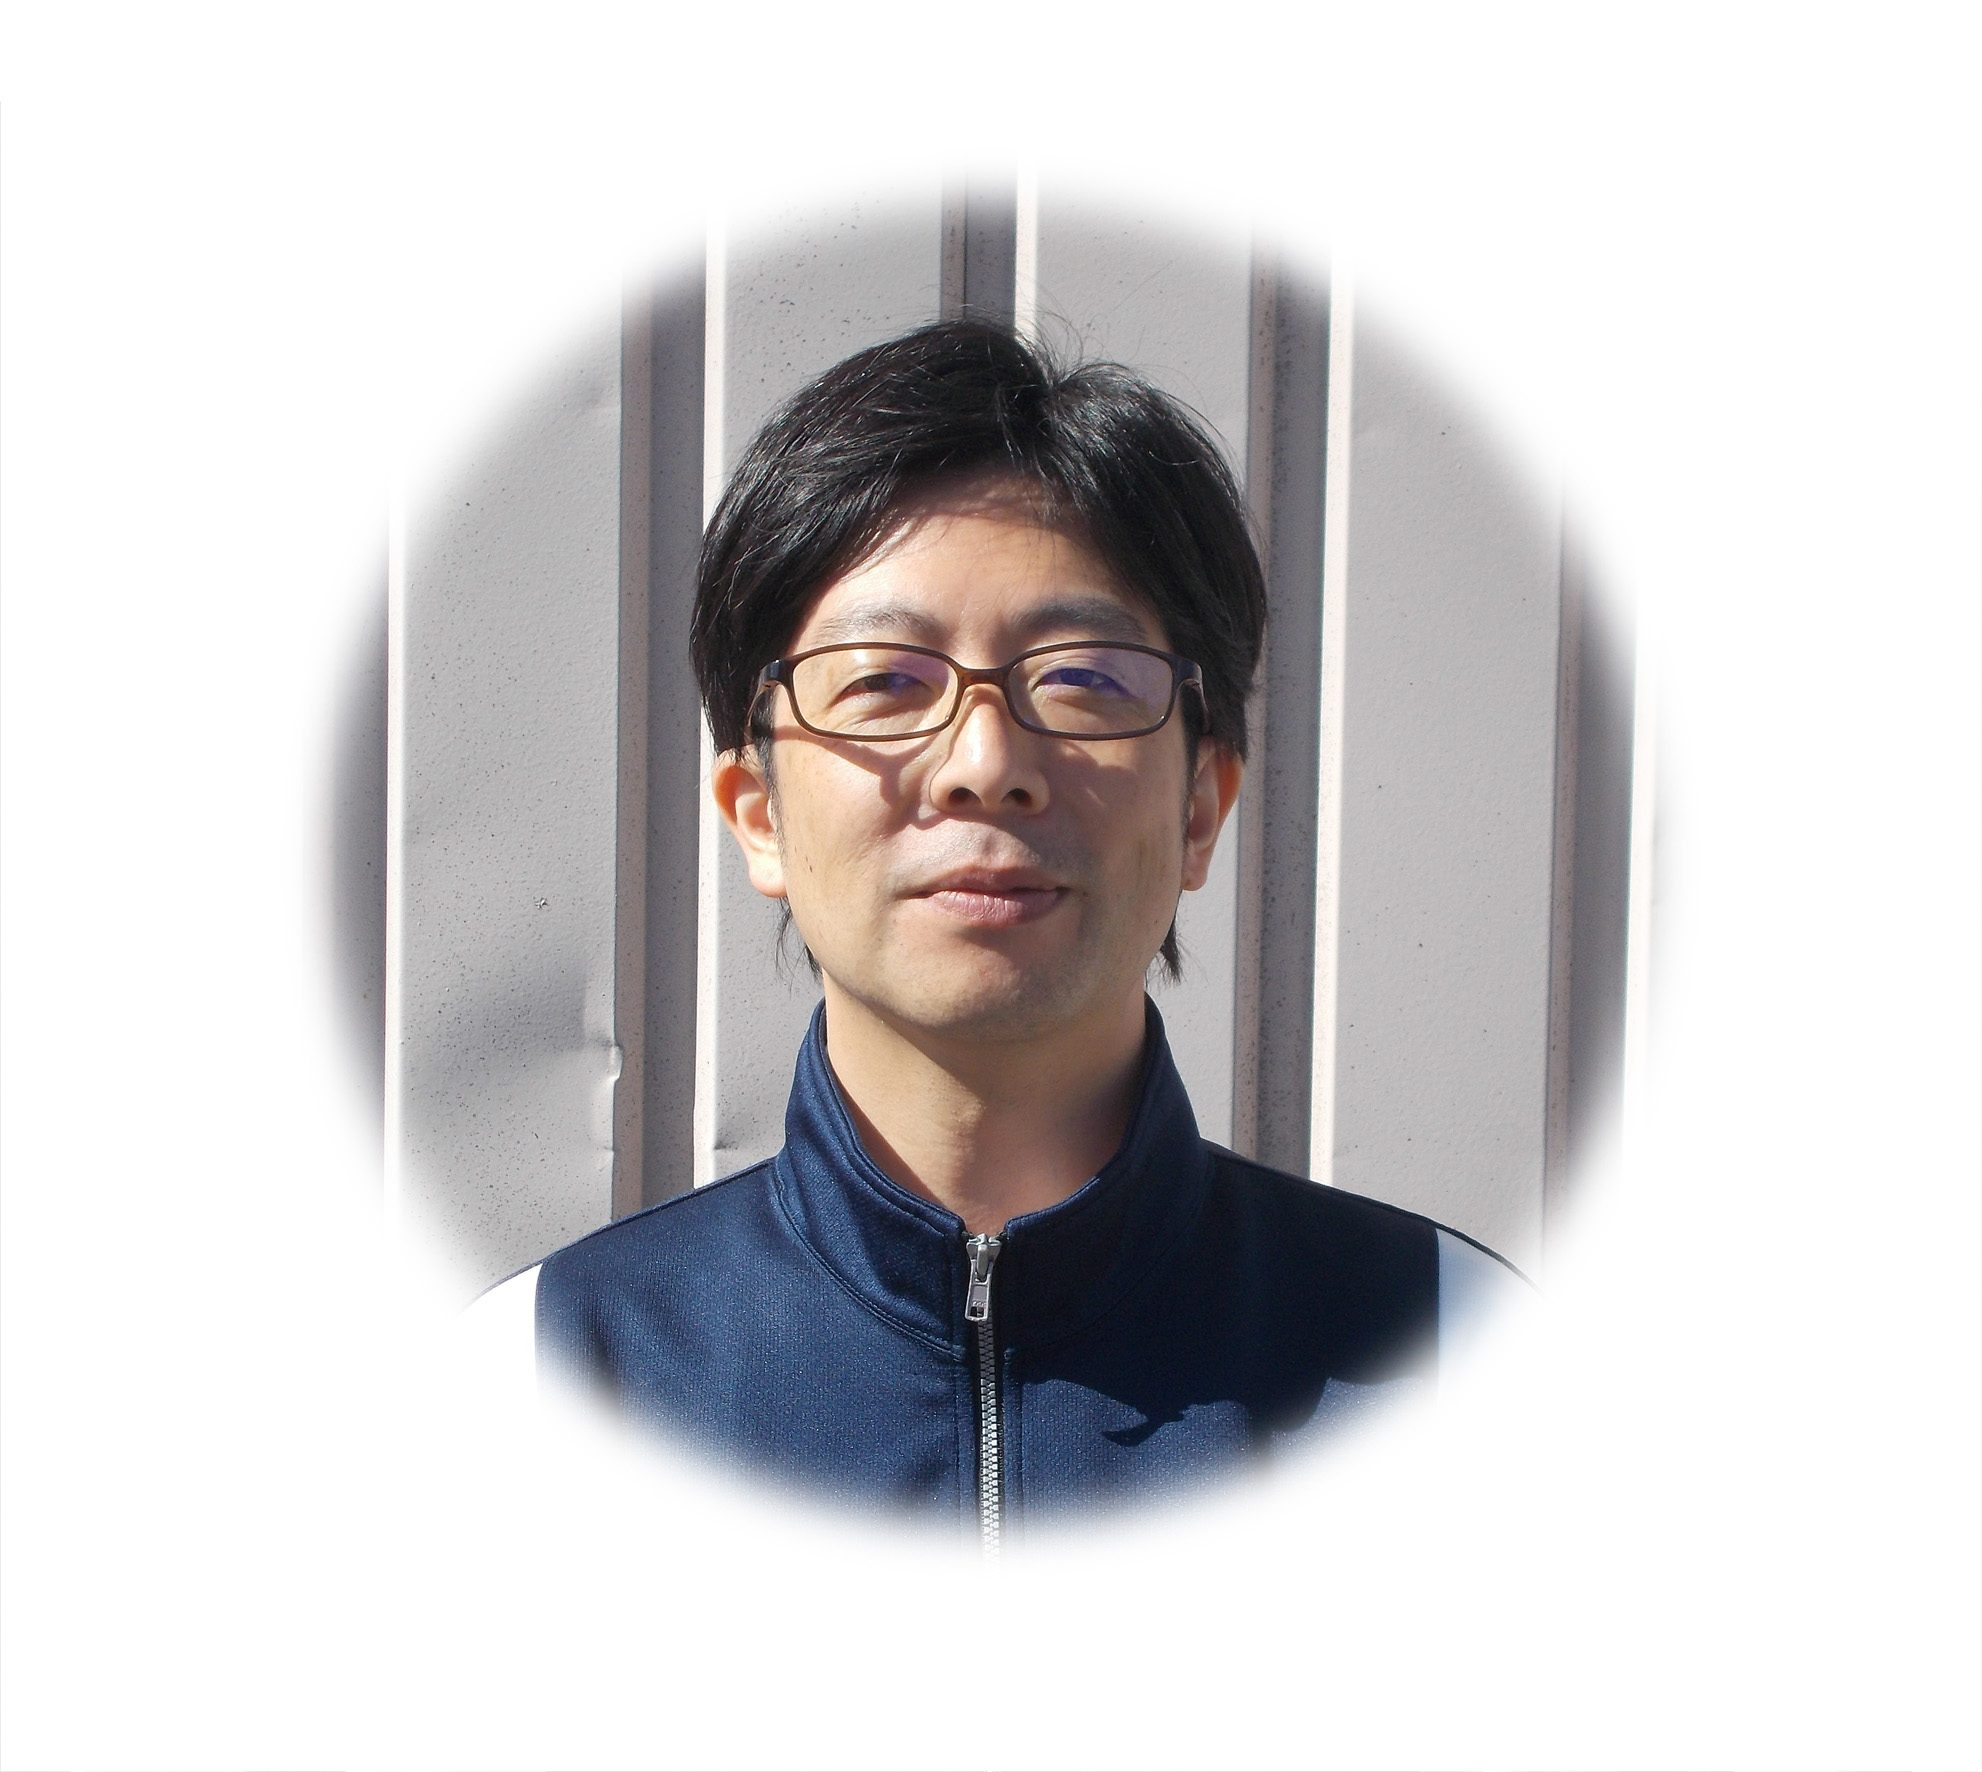 DS志津_高井生活相談員_20190204